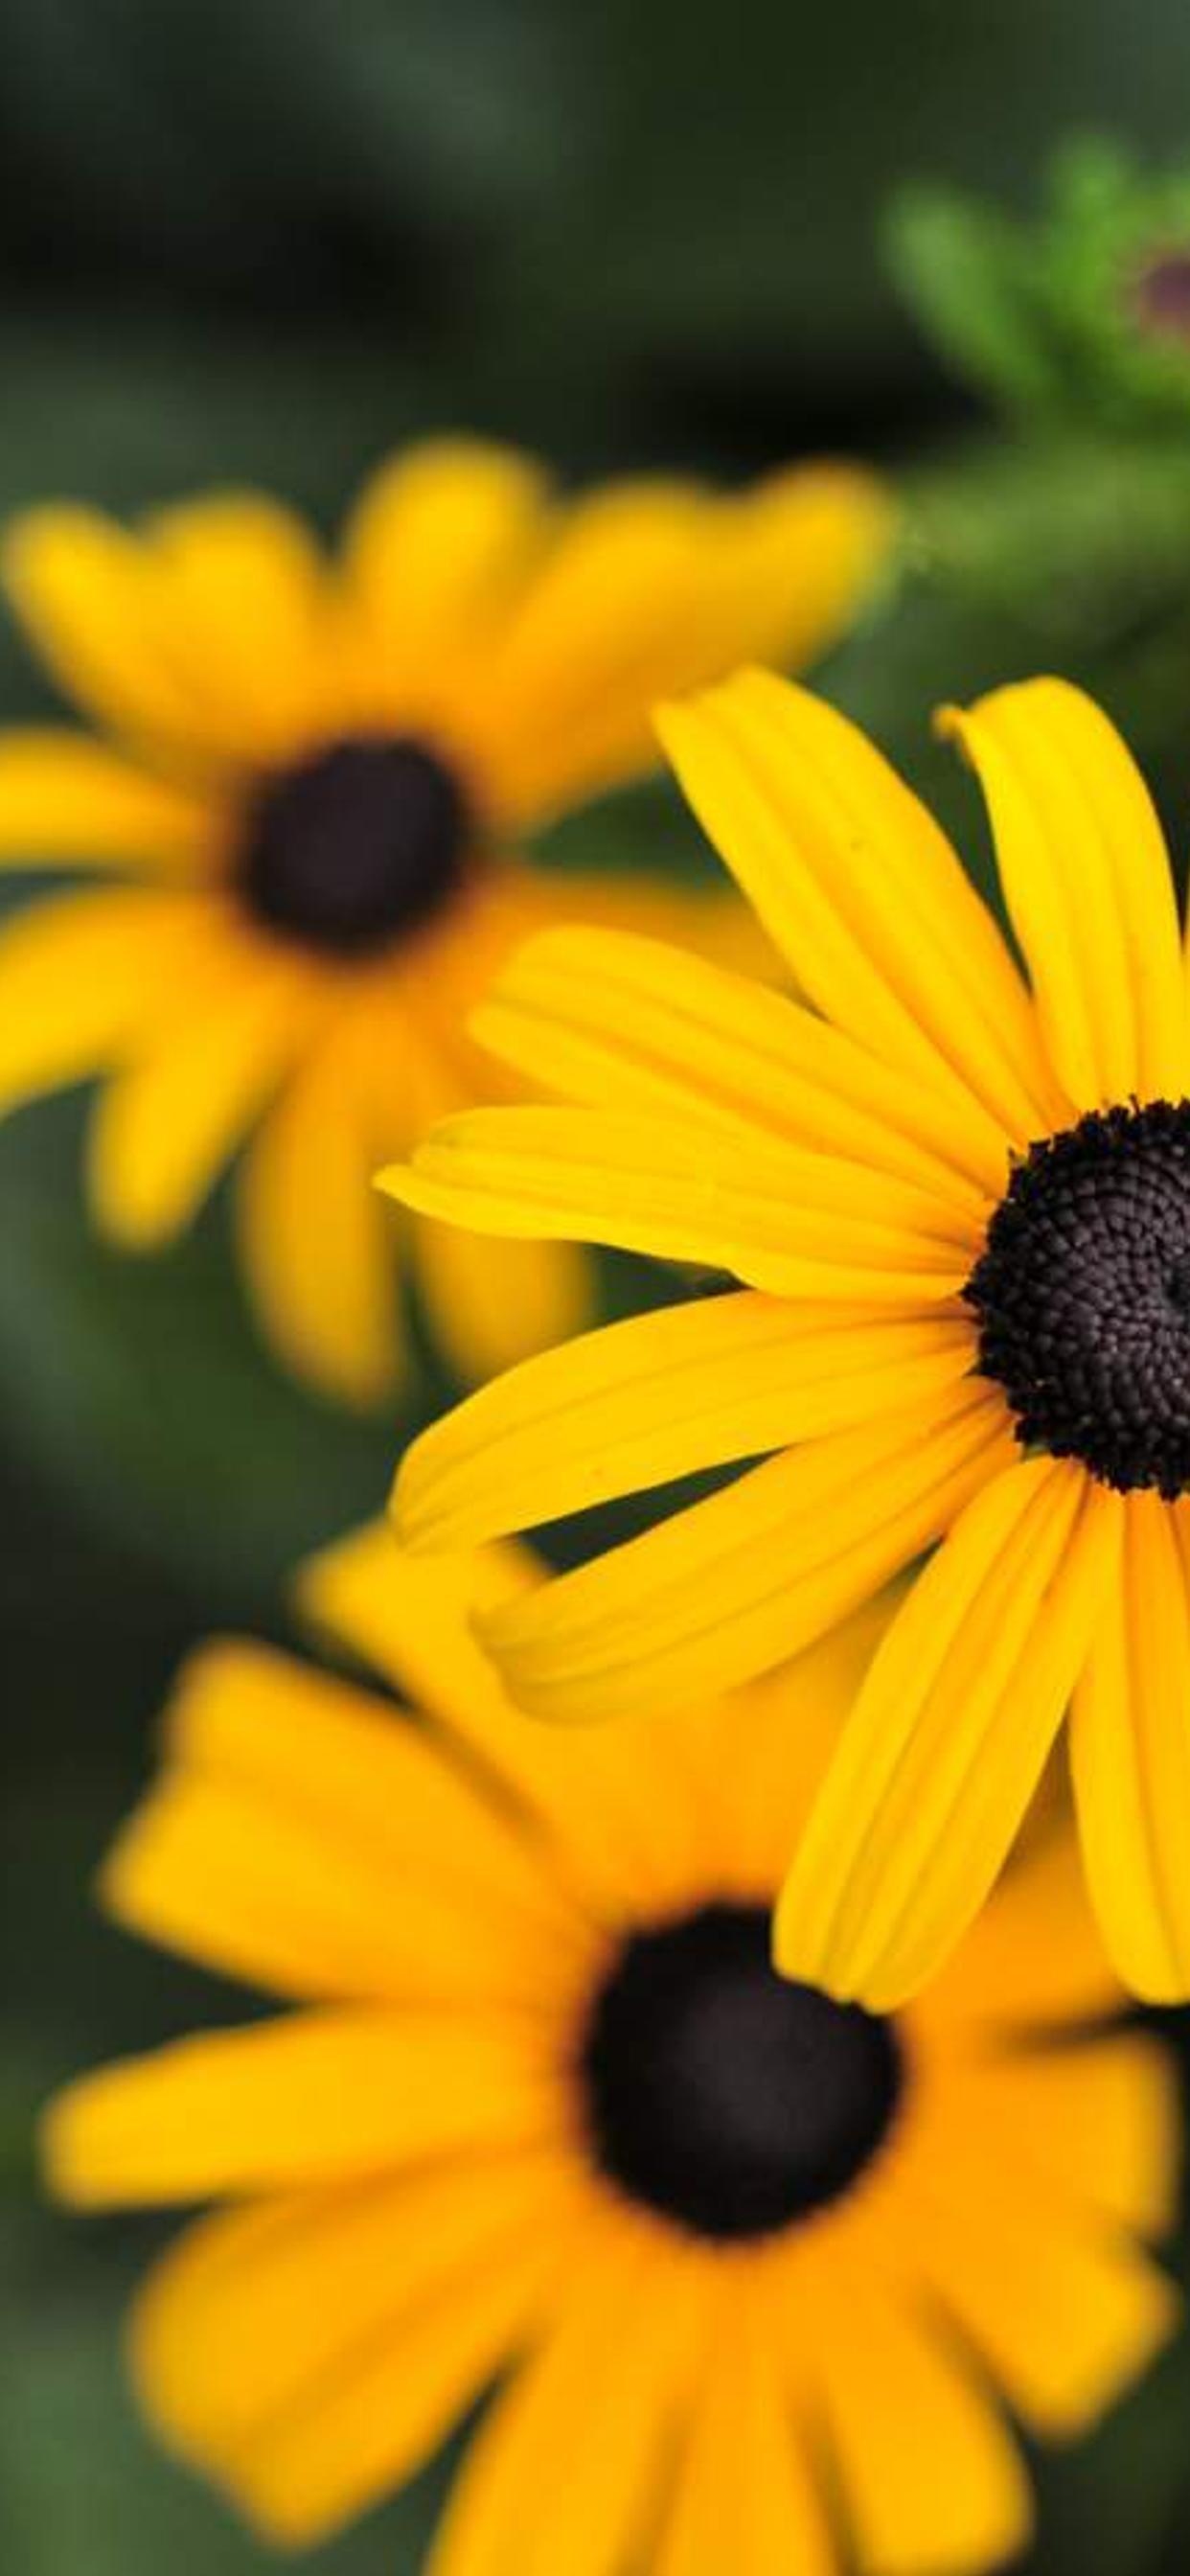 Yellow Flowers Gloriosa Daisy Hd Wallpaper